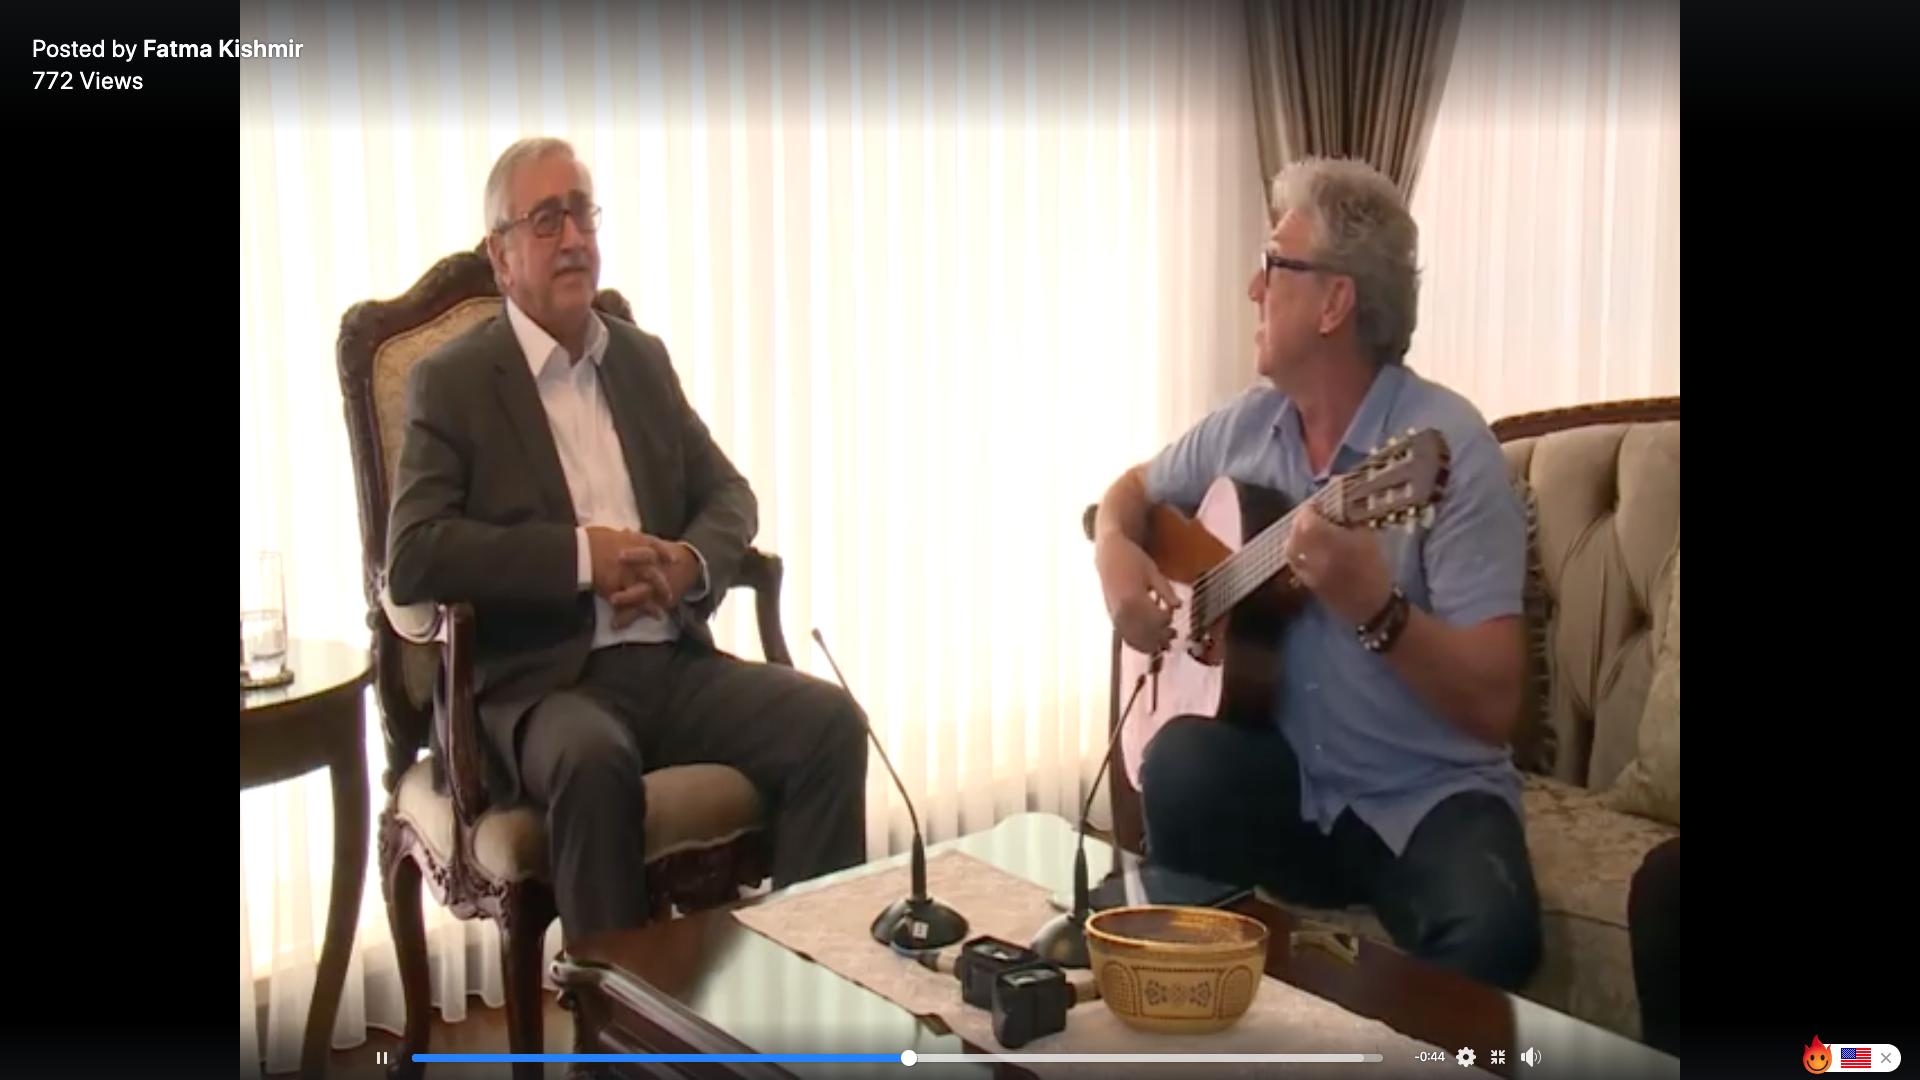 President Akinci sings Mağusa Limanı 6